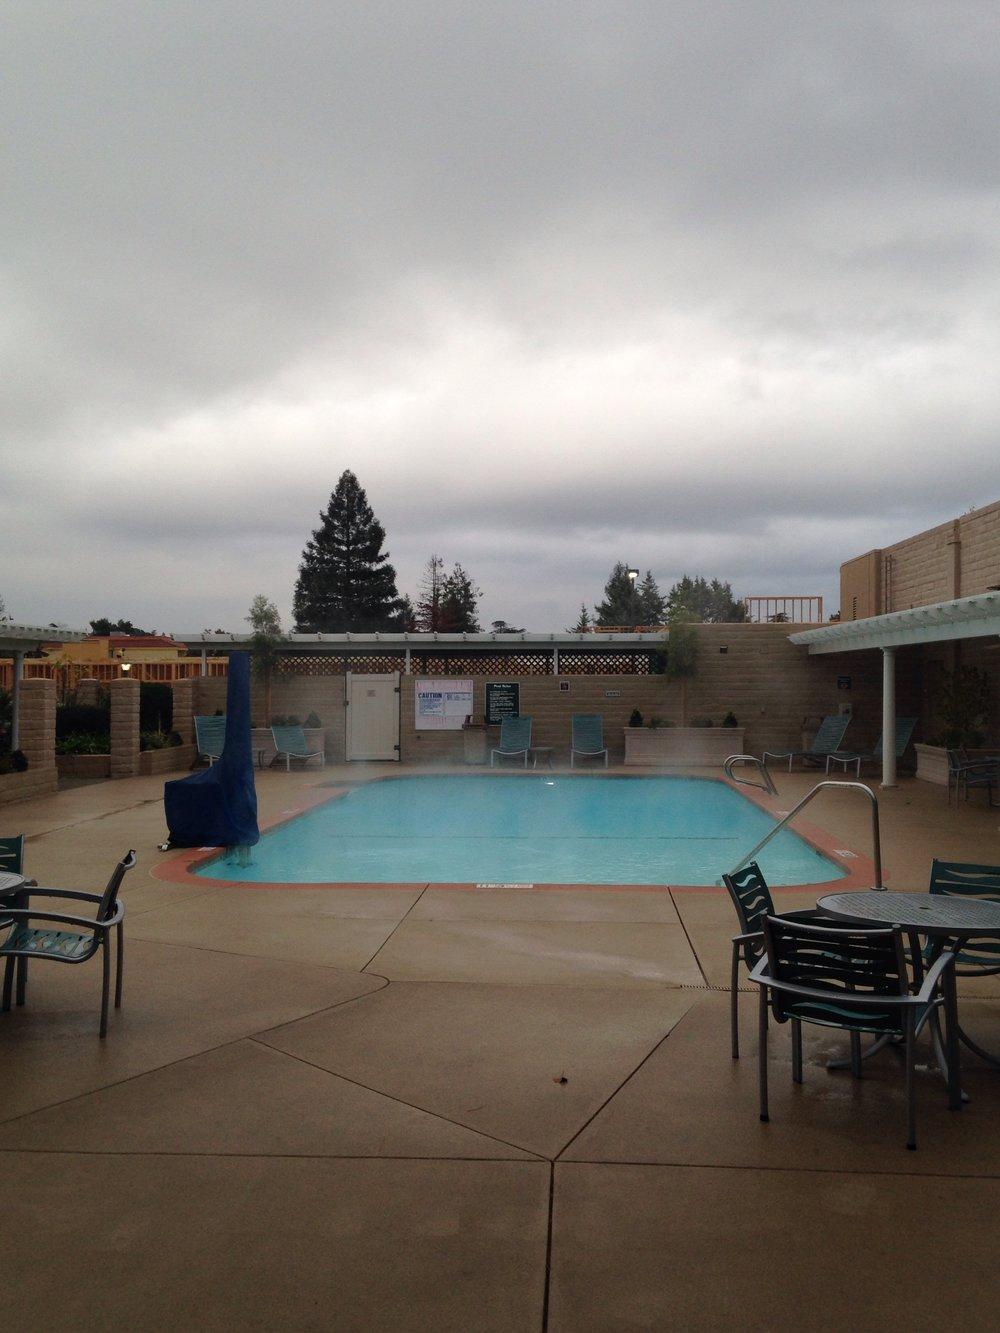 Swimming pool, Best Western Hotel, Redding, CA. 11/30/16